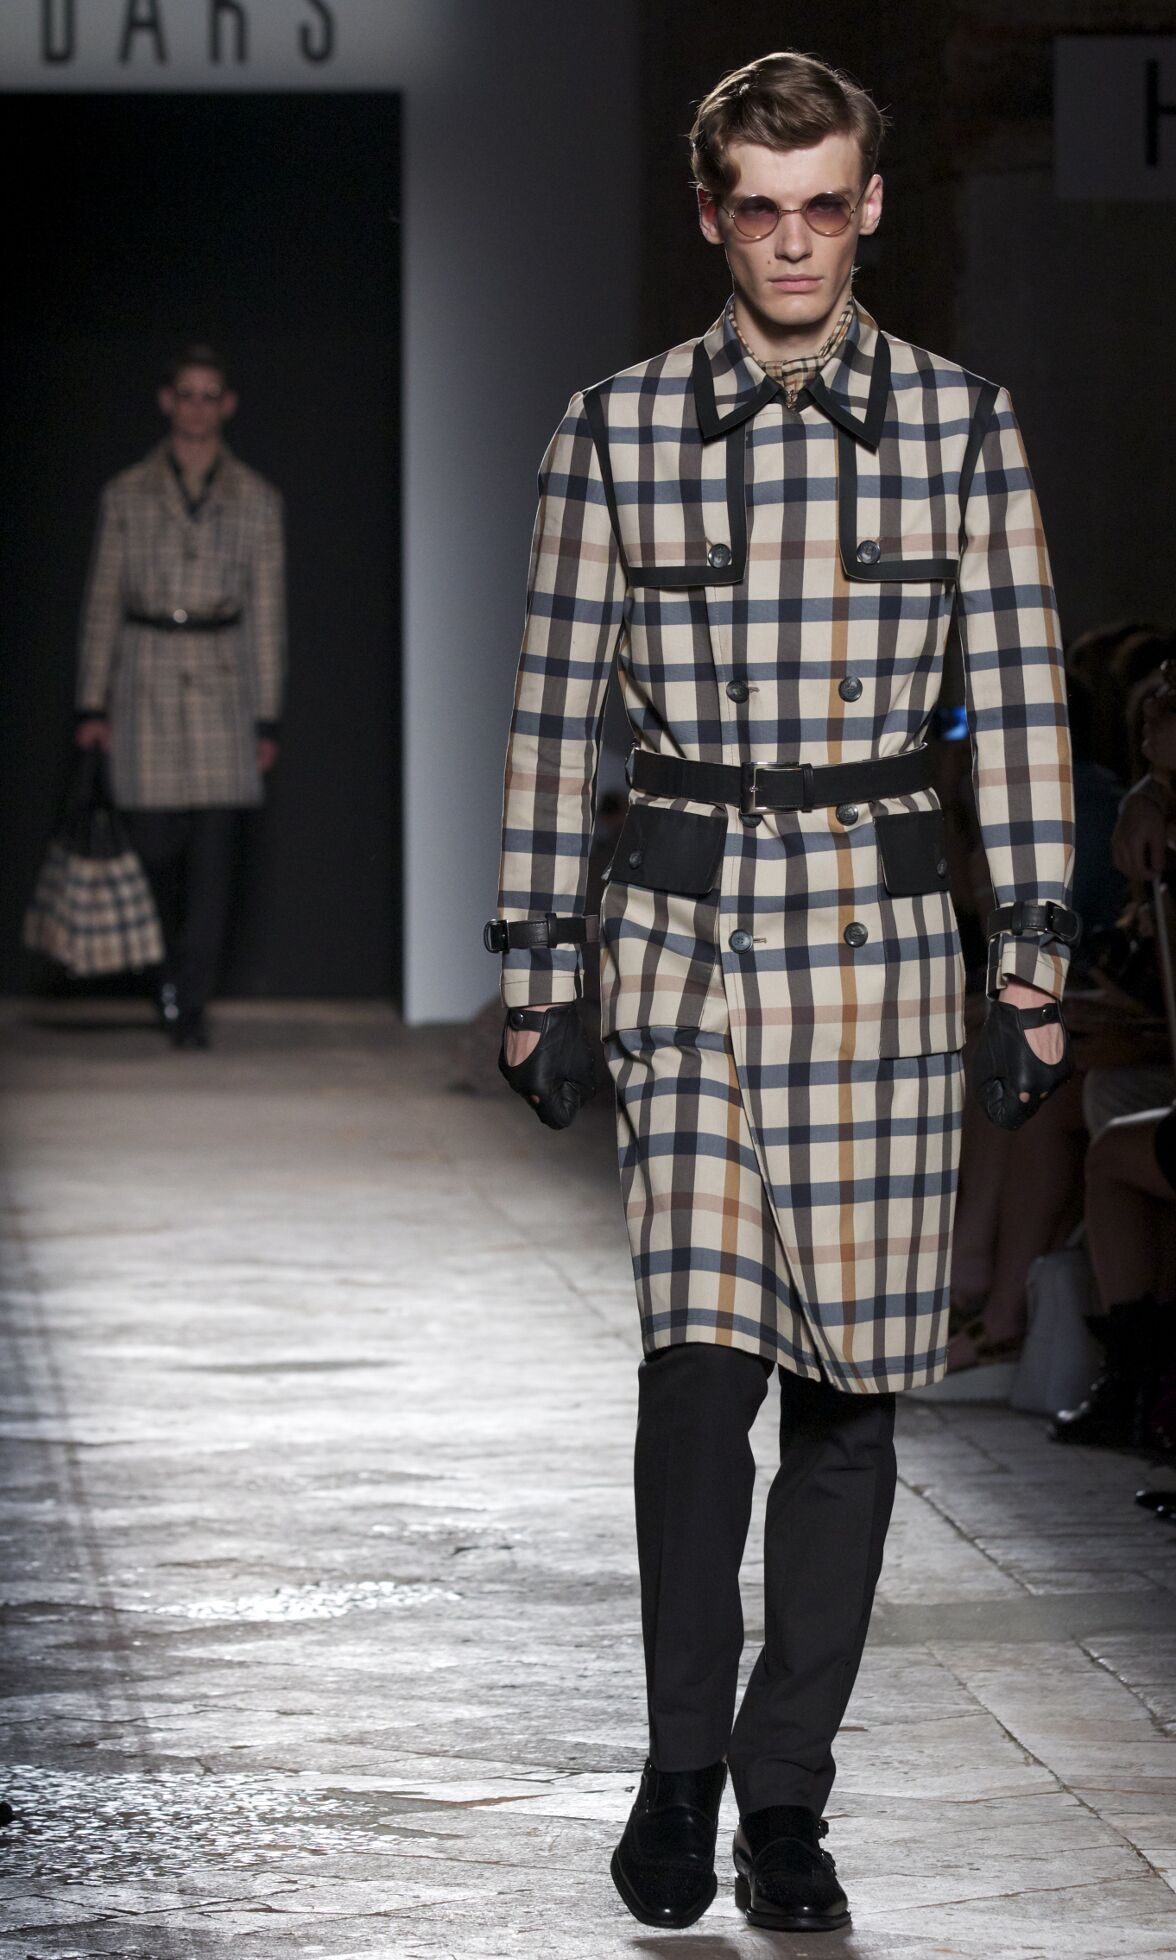 Fashion Model Daks Catwalk